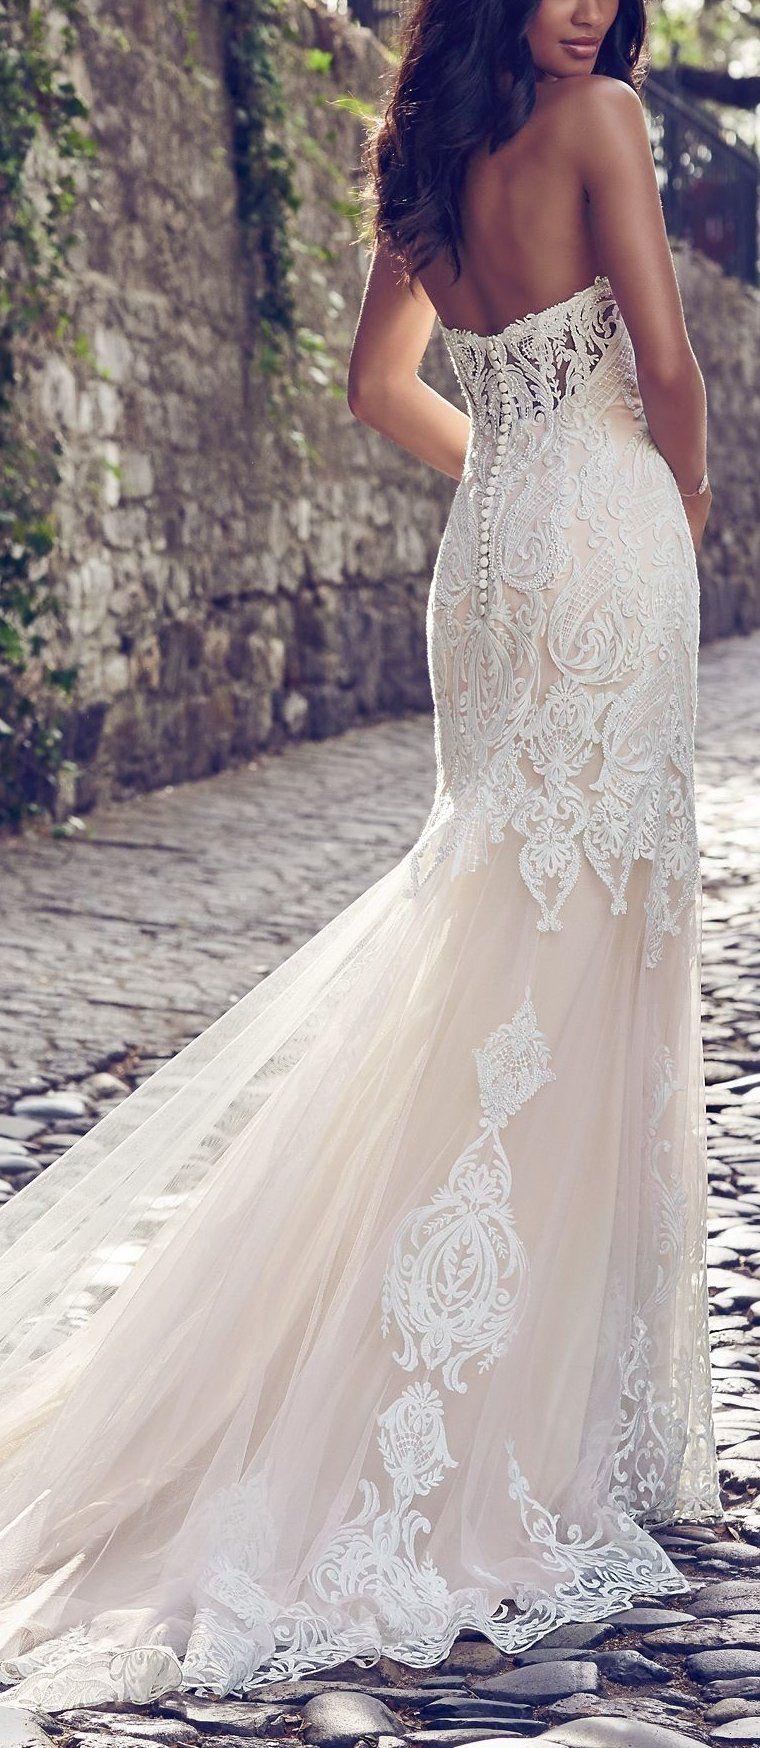 AUTUMN by Maggie Sottero Wedding Dresses in 2019  ebc1c3756ce3